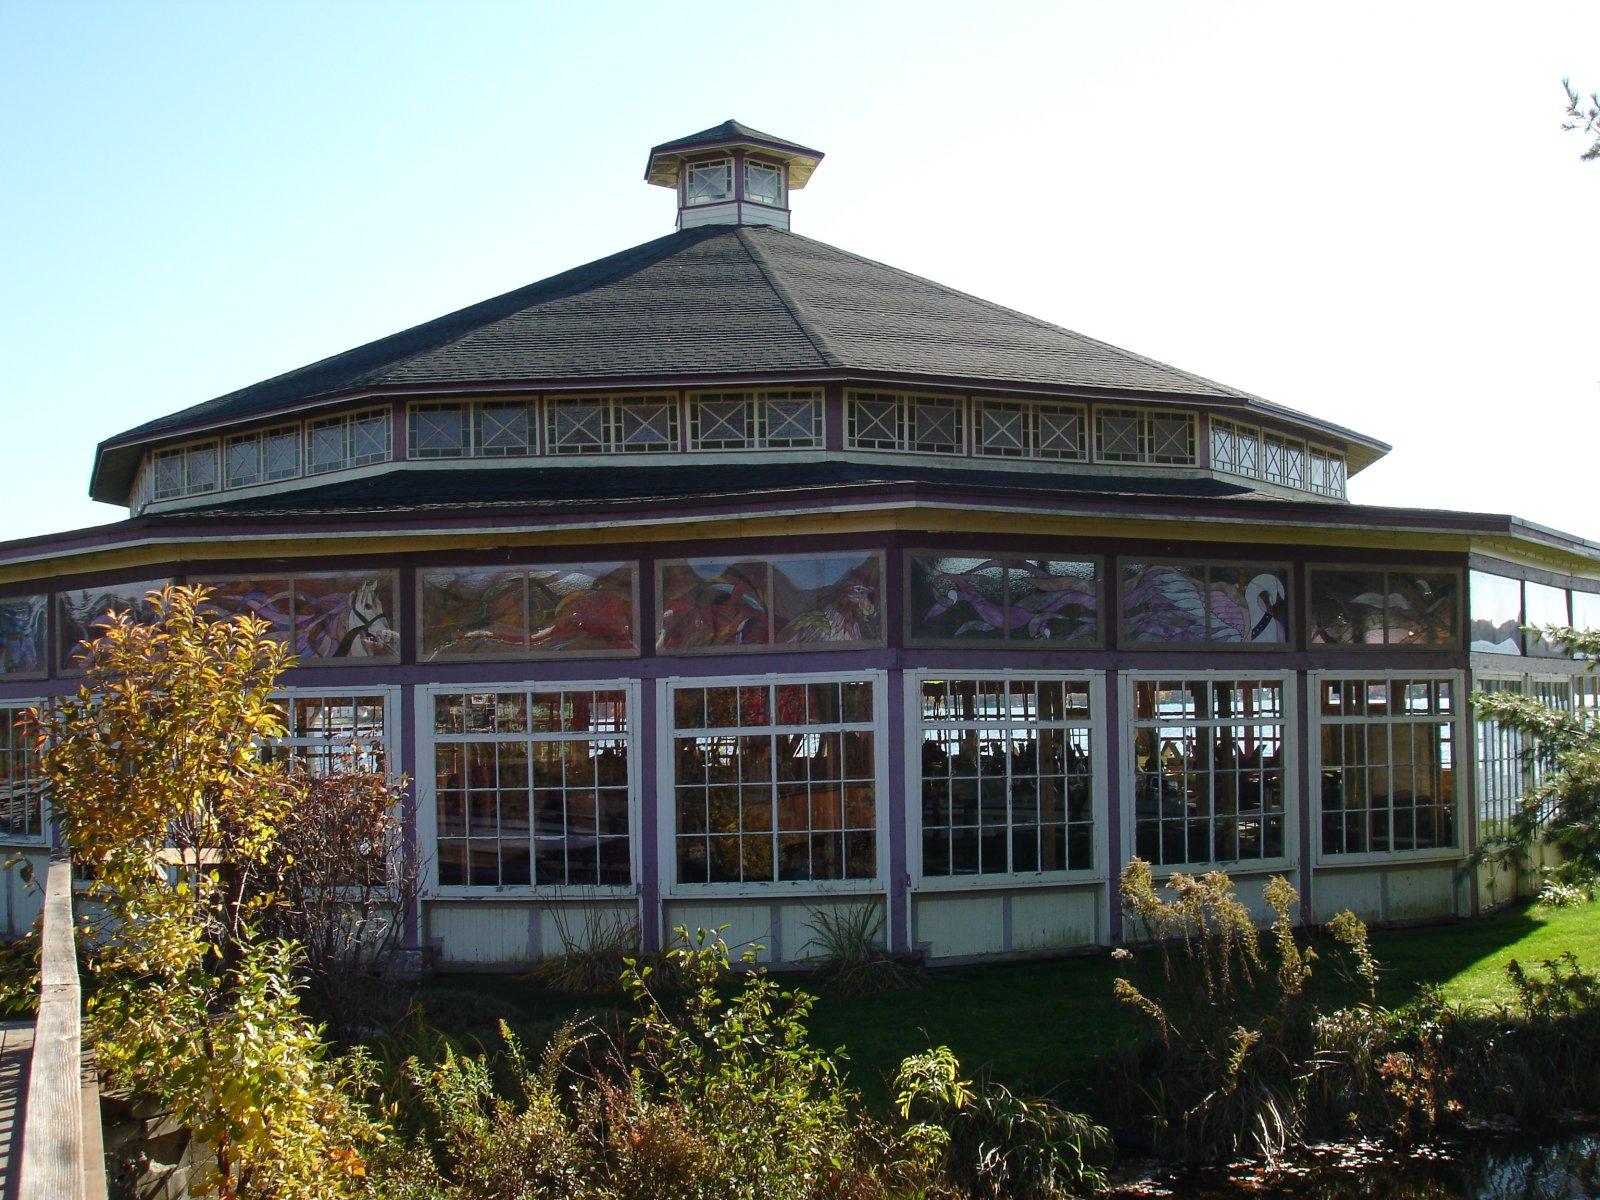 Click image for larger version  Name:Adirondack Leaf Peep'n October 2008 013.jpg Views:75 Size:400.4 KB ID:74573